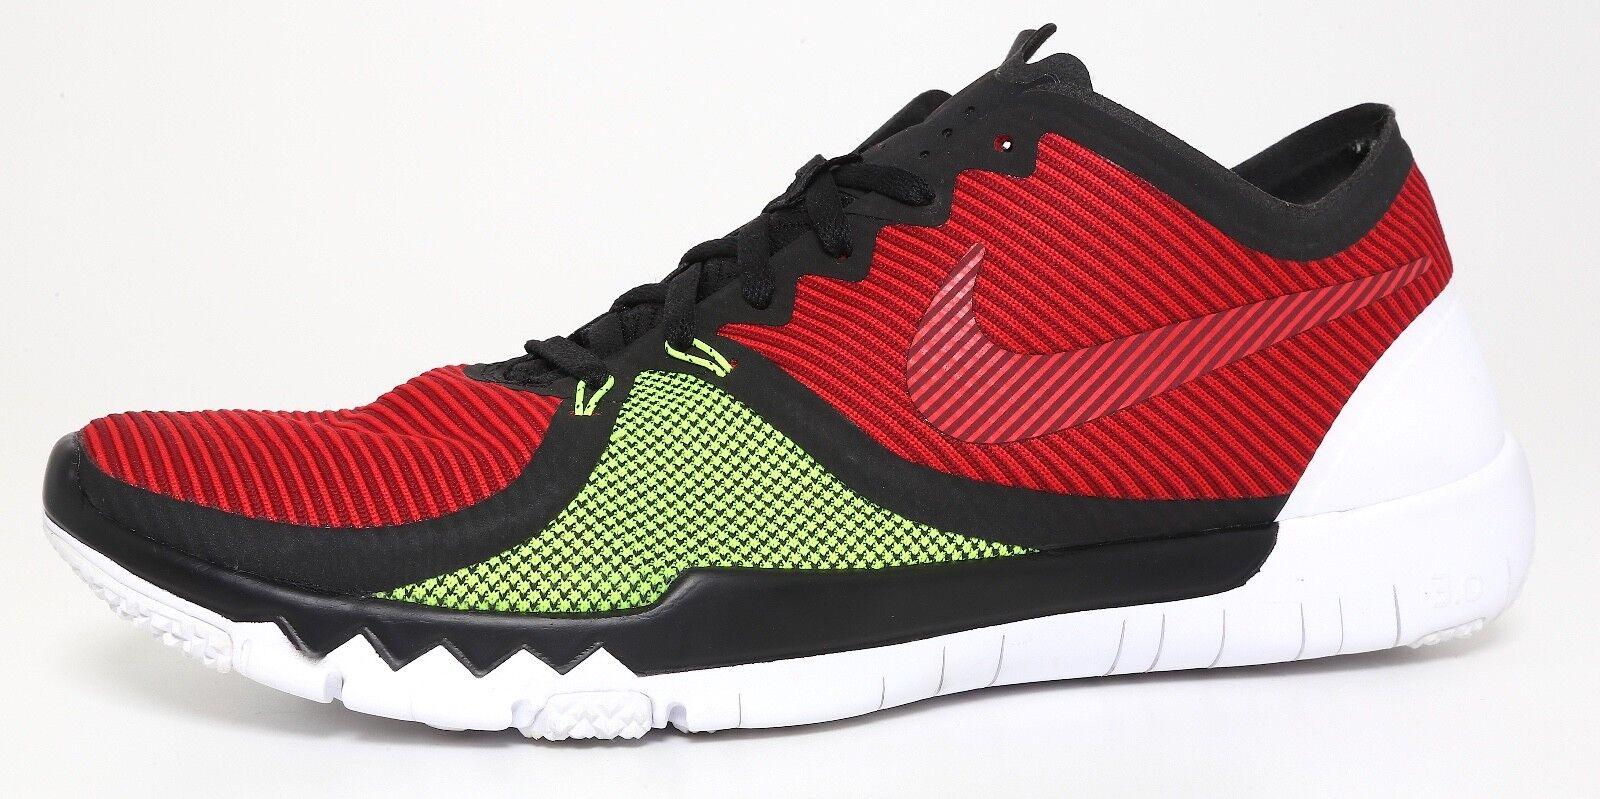 Nike 3.0 Training Sneakers Multi Color Men Sz 10 4128